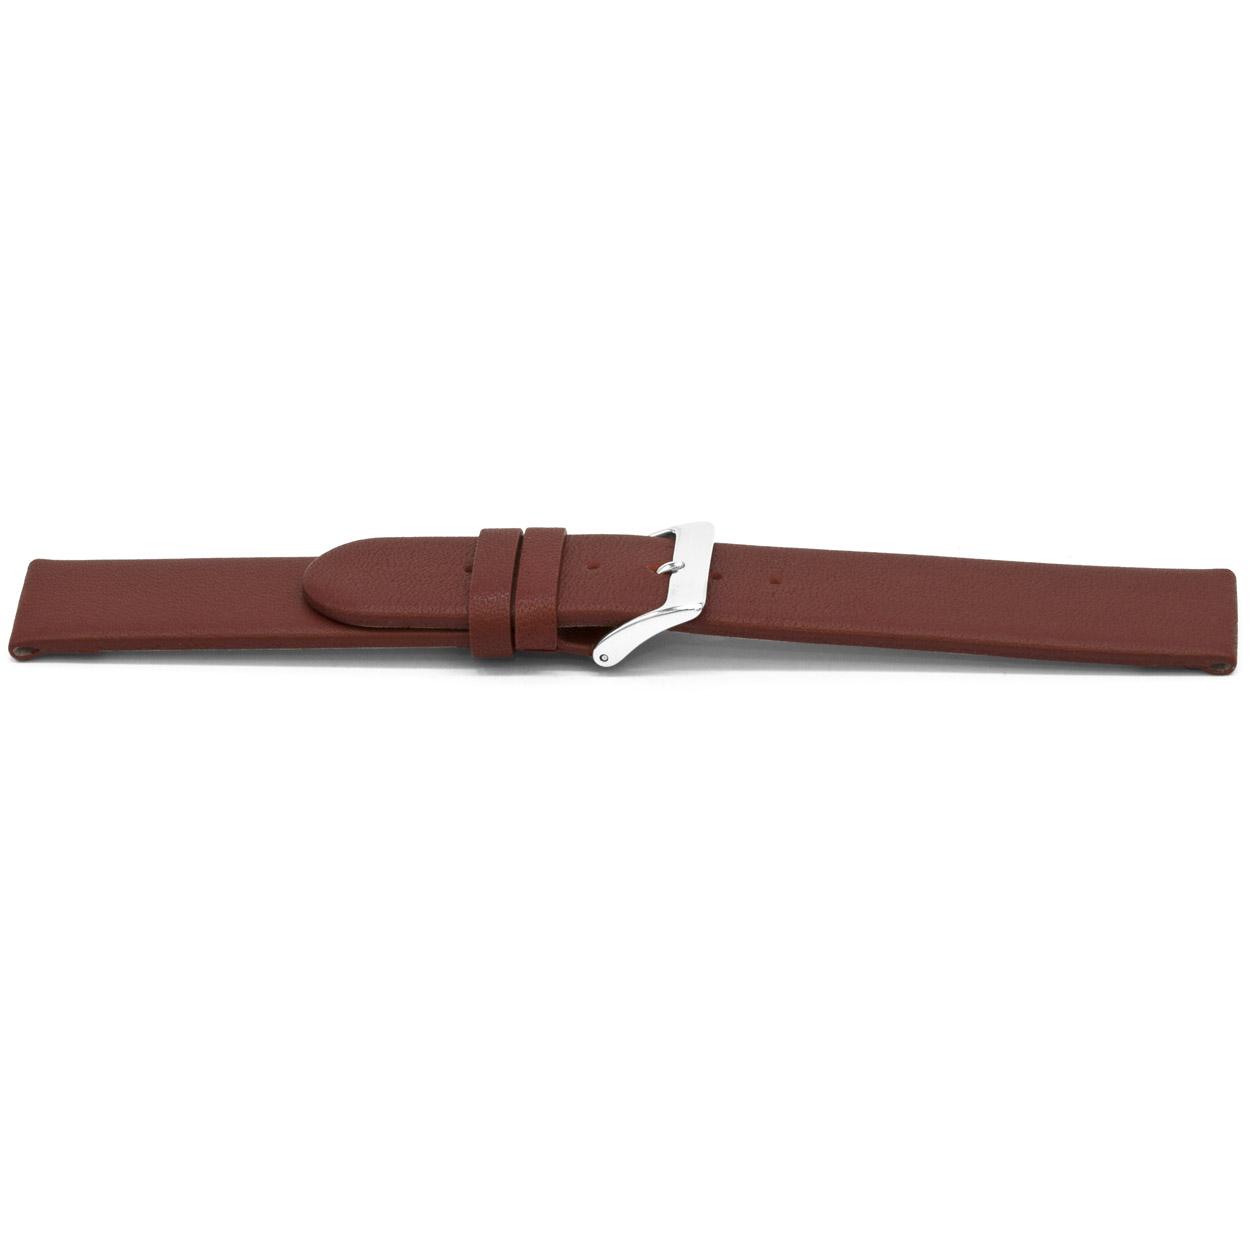 Horlogeband G706 leder rood 20mm